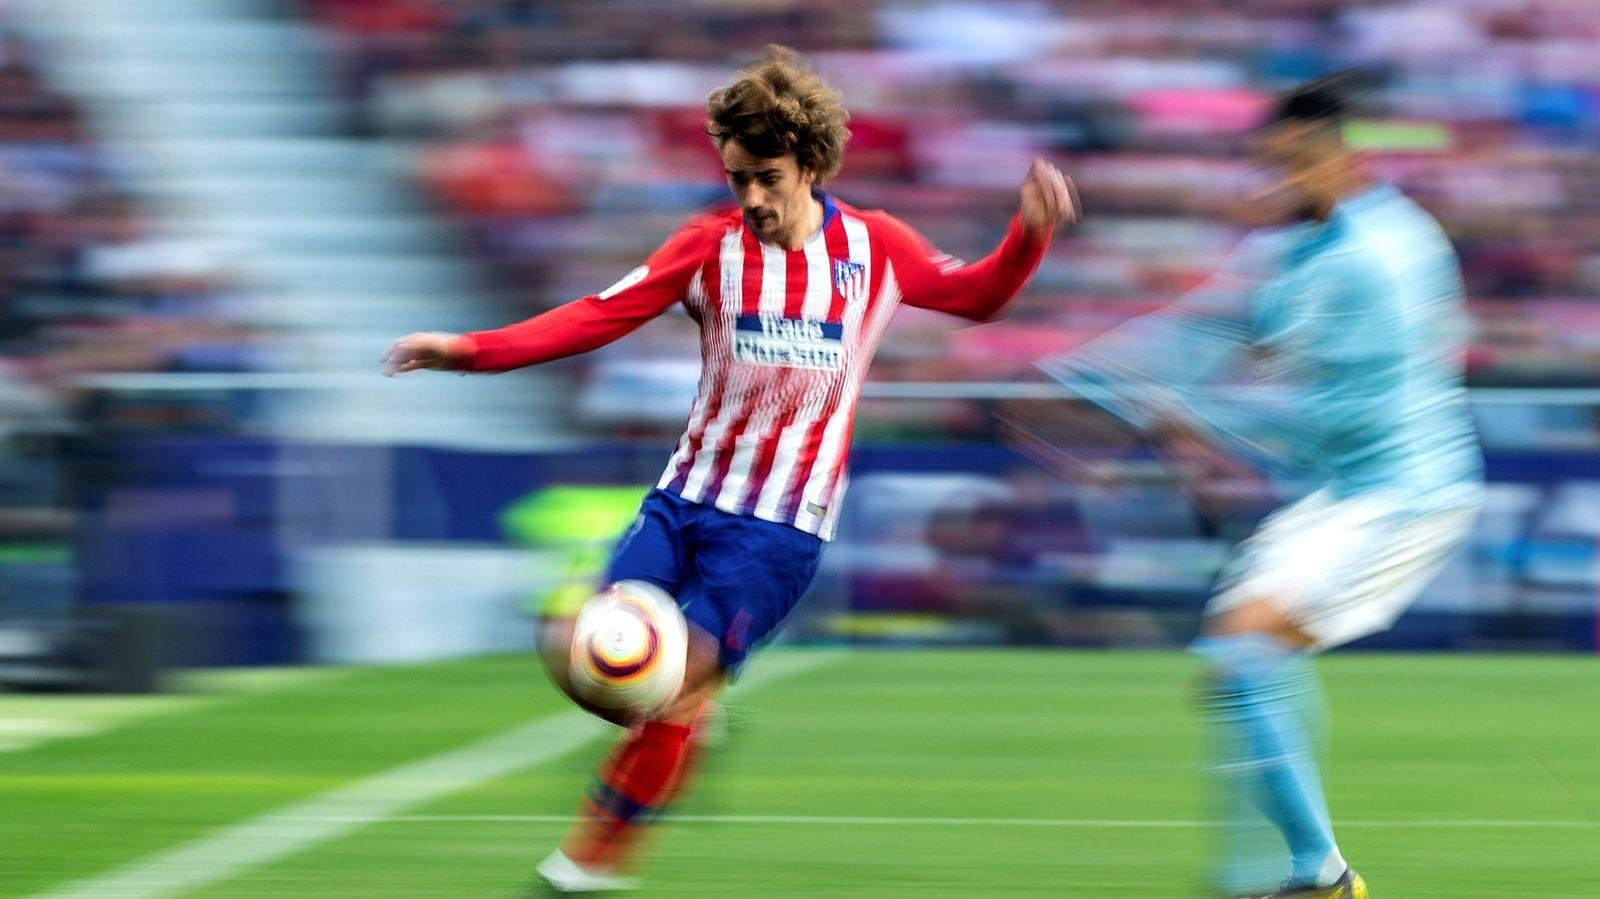 Foto: Atlético madrid - celta